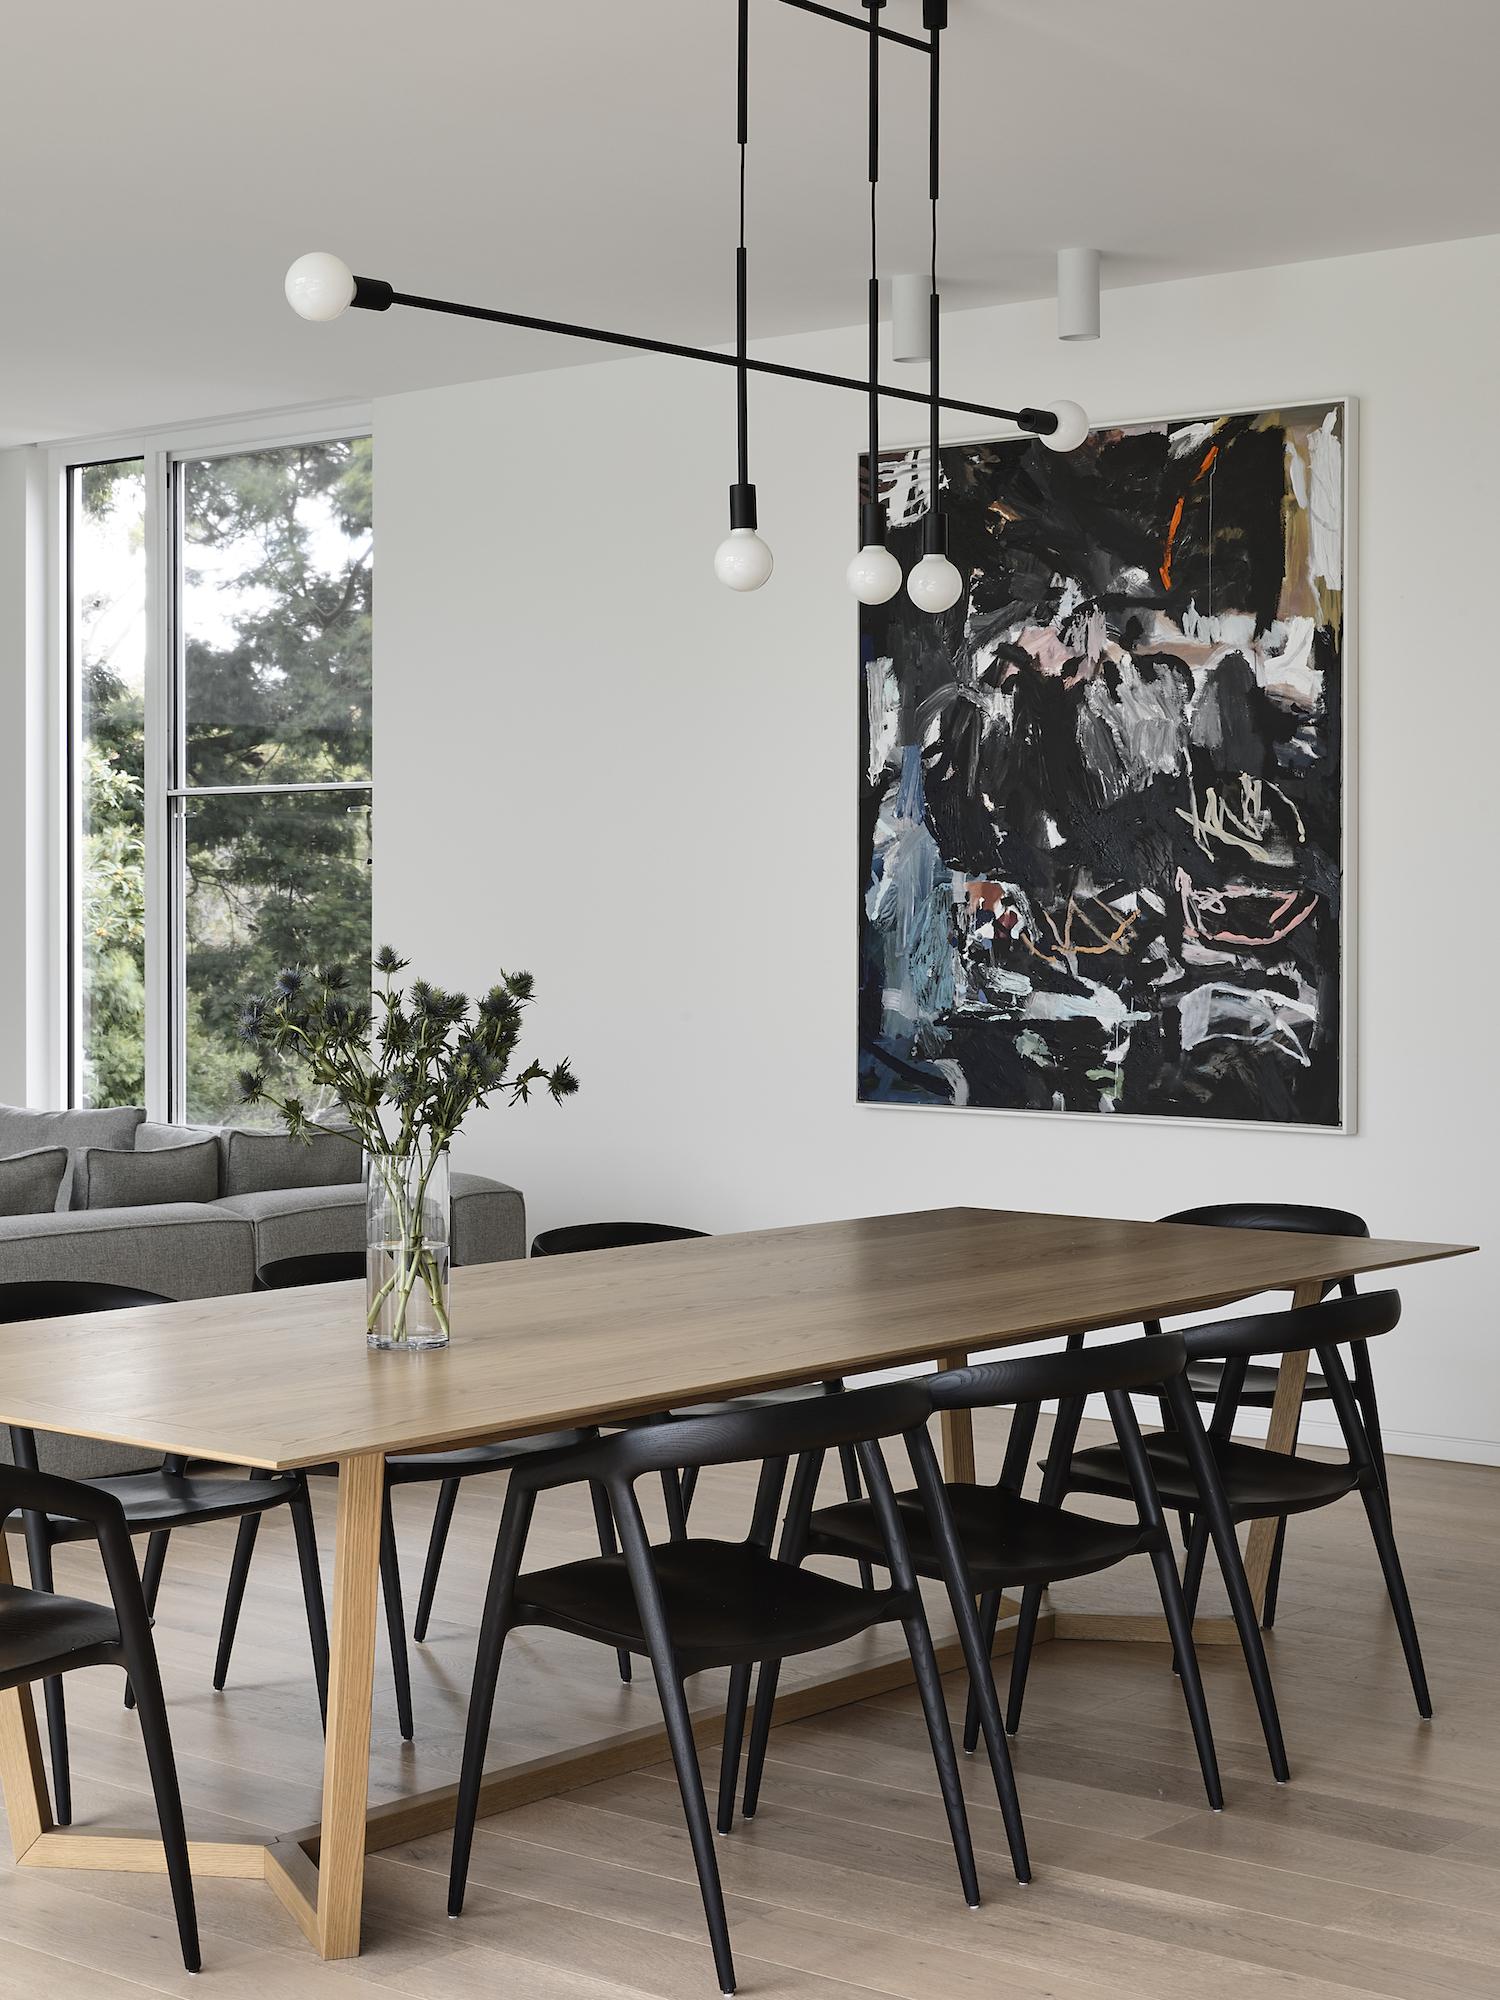 est living sorrento light house wolveridge architects 2